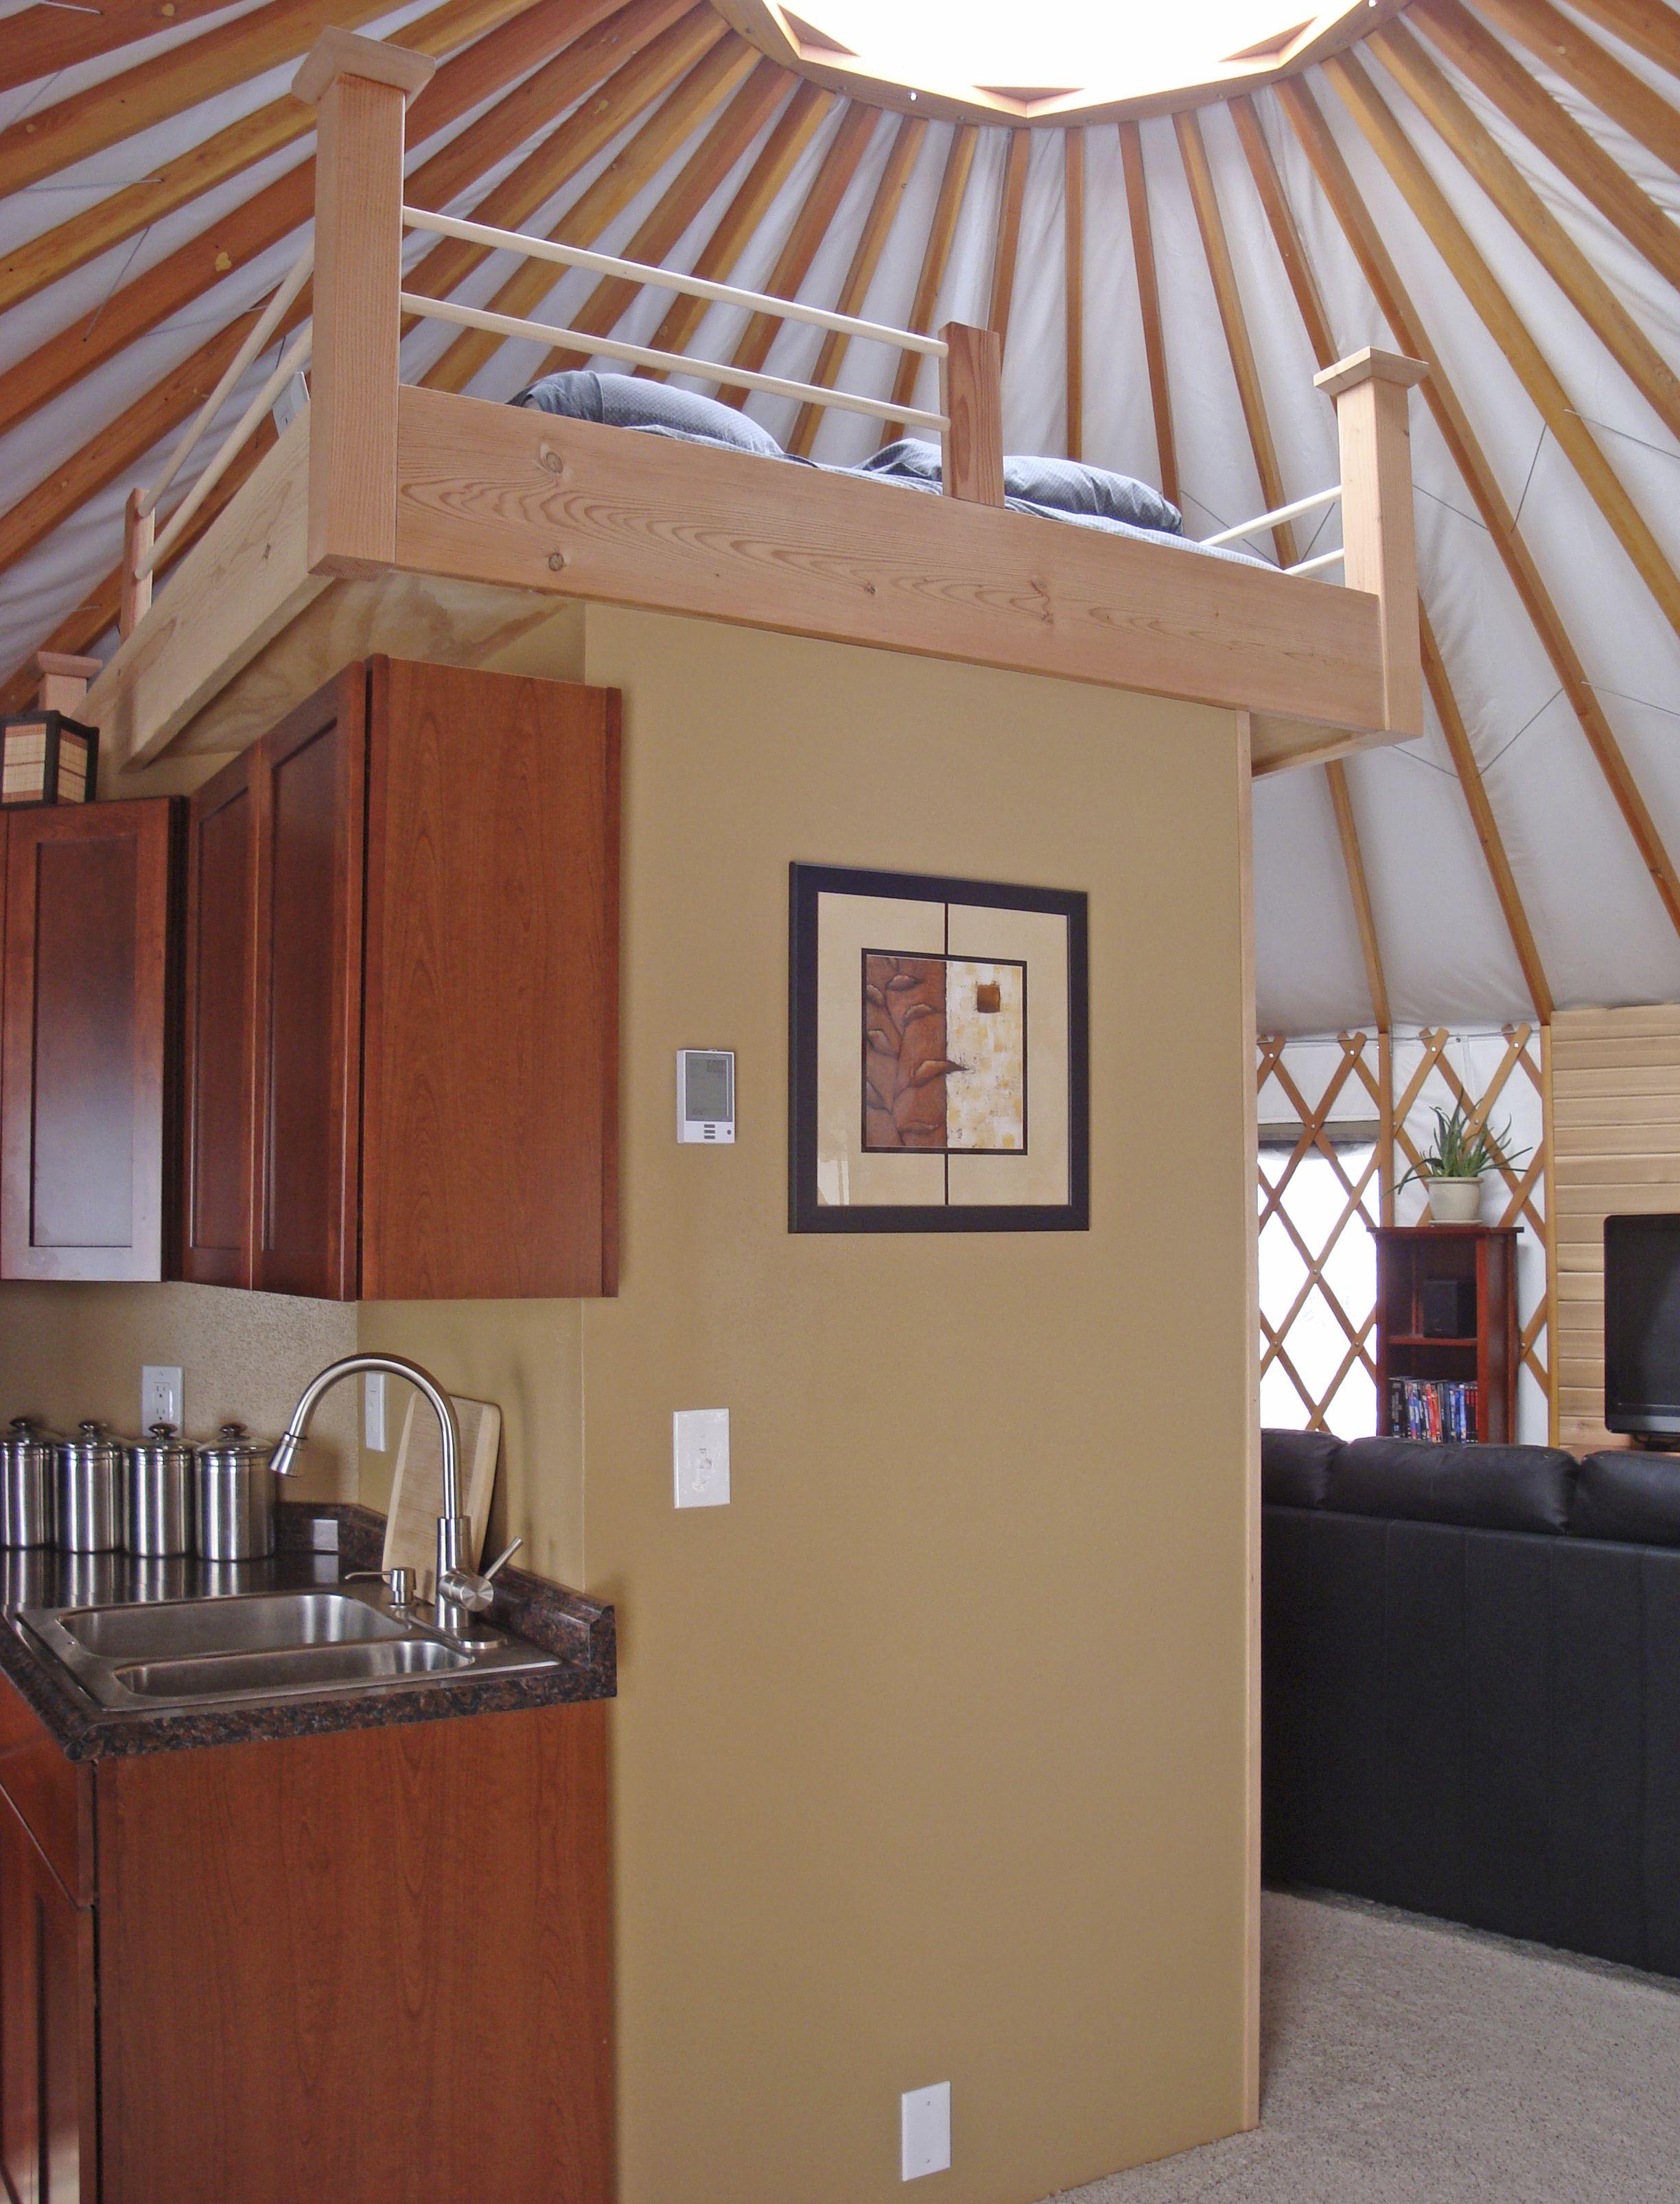 Lofty ideas pacific yurts yurt living pinterest for Yurt interior designs